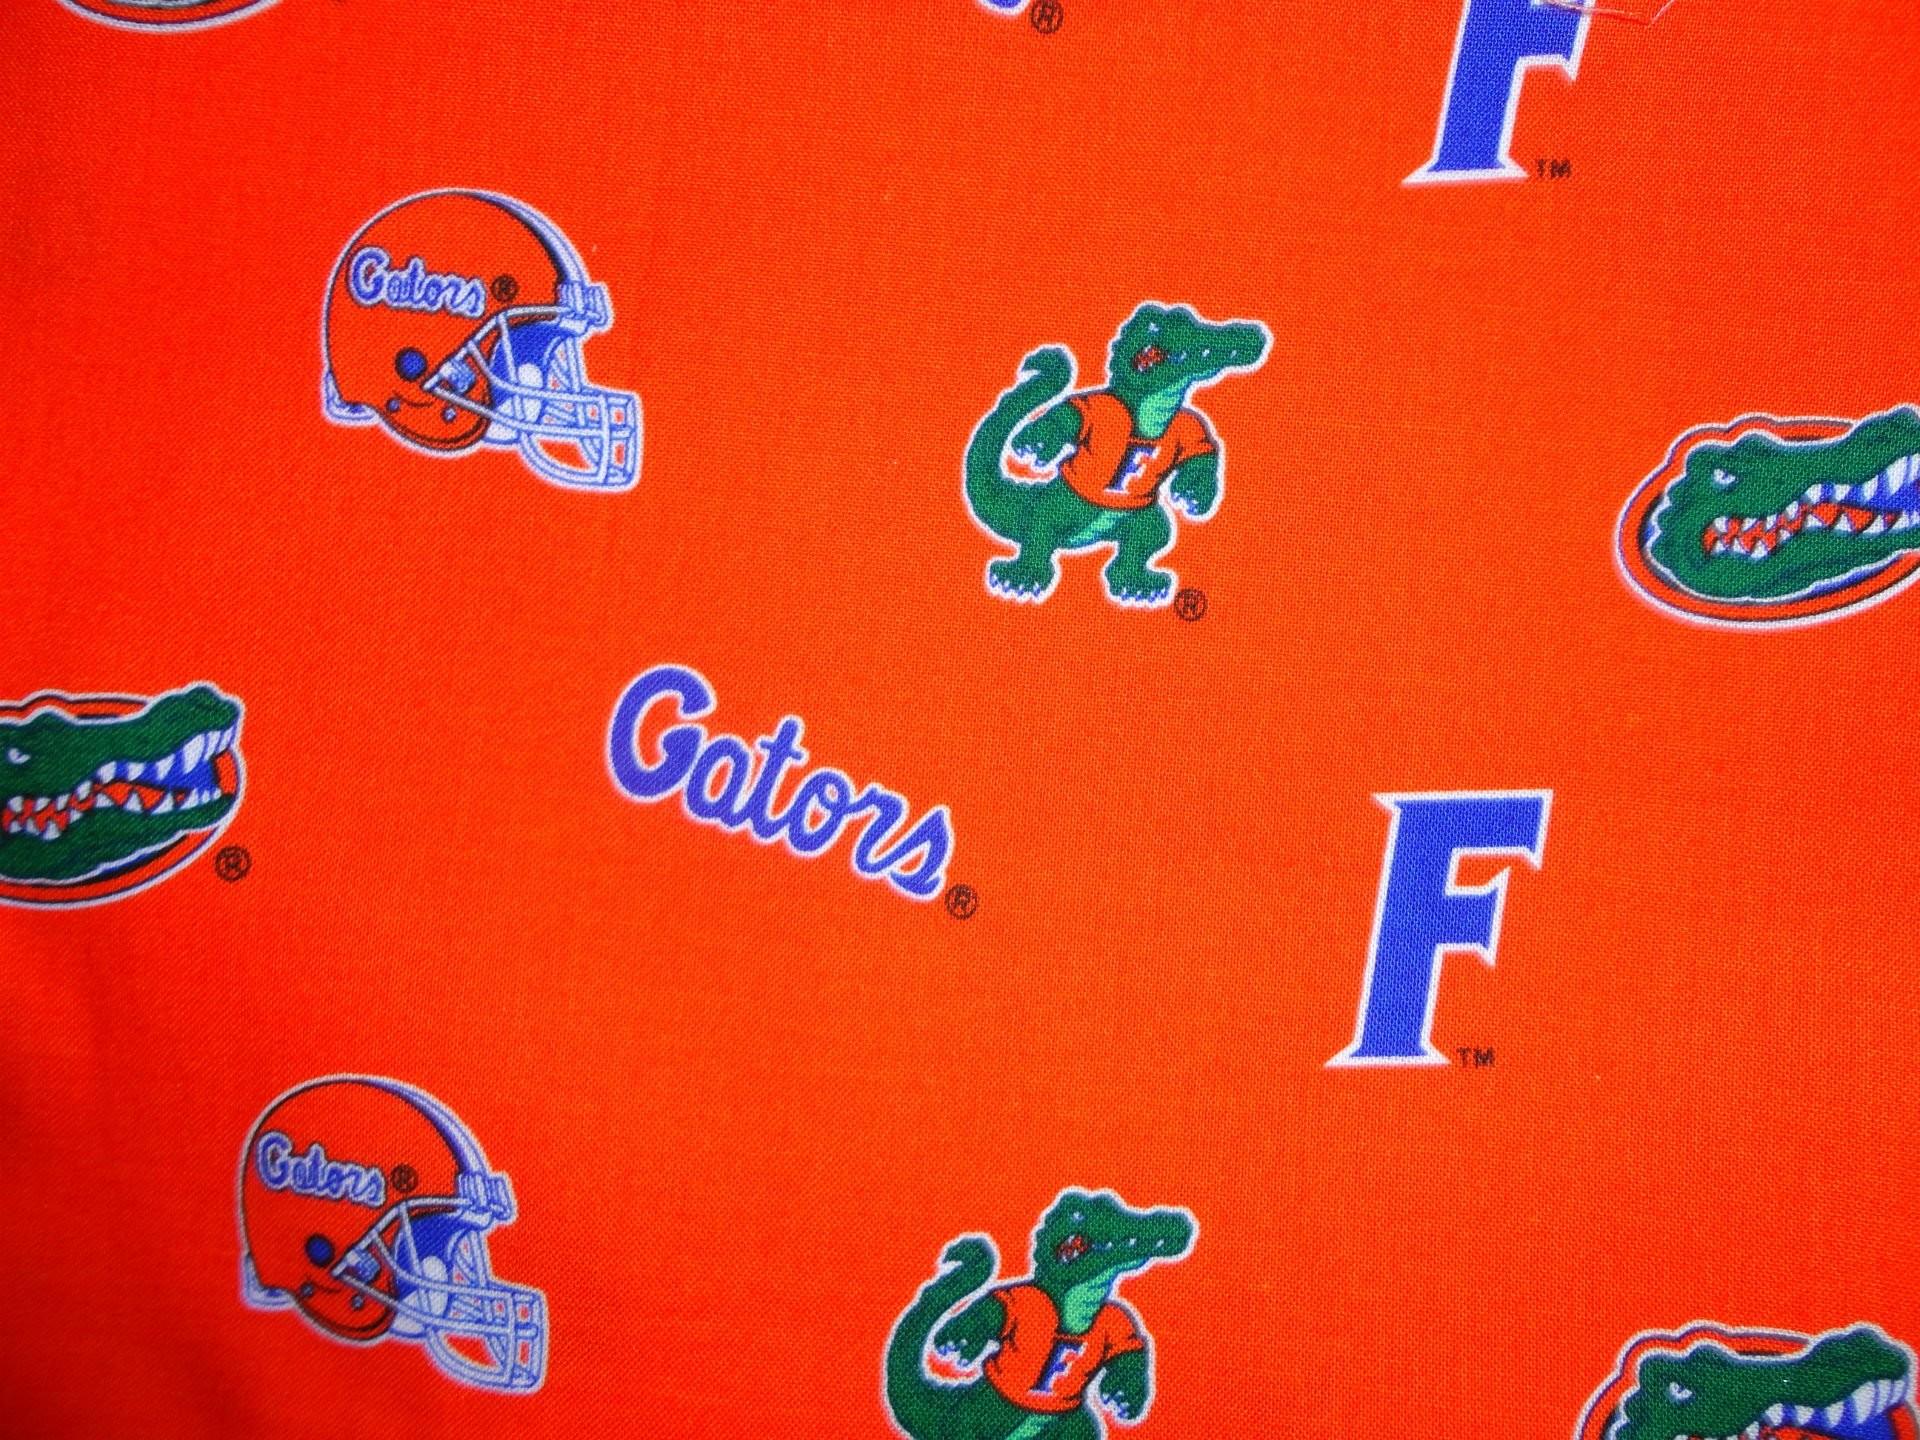 Florida Gators Football Wallpapers 1